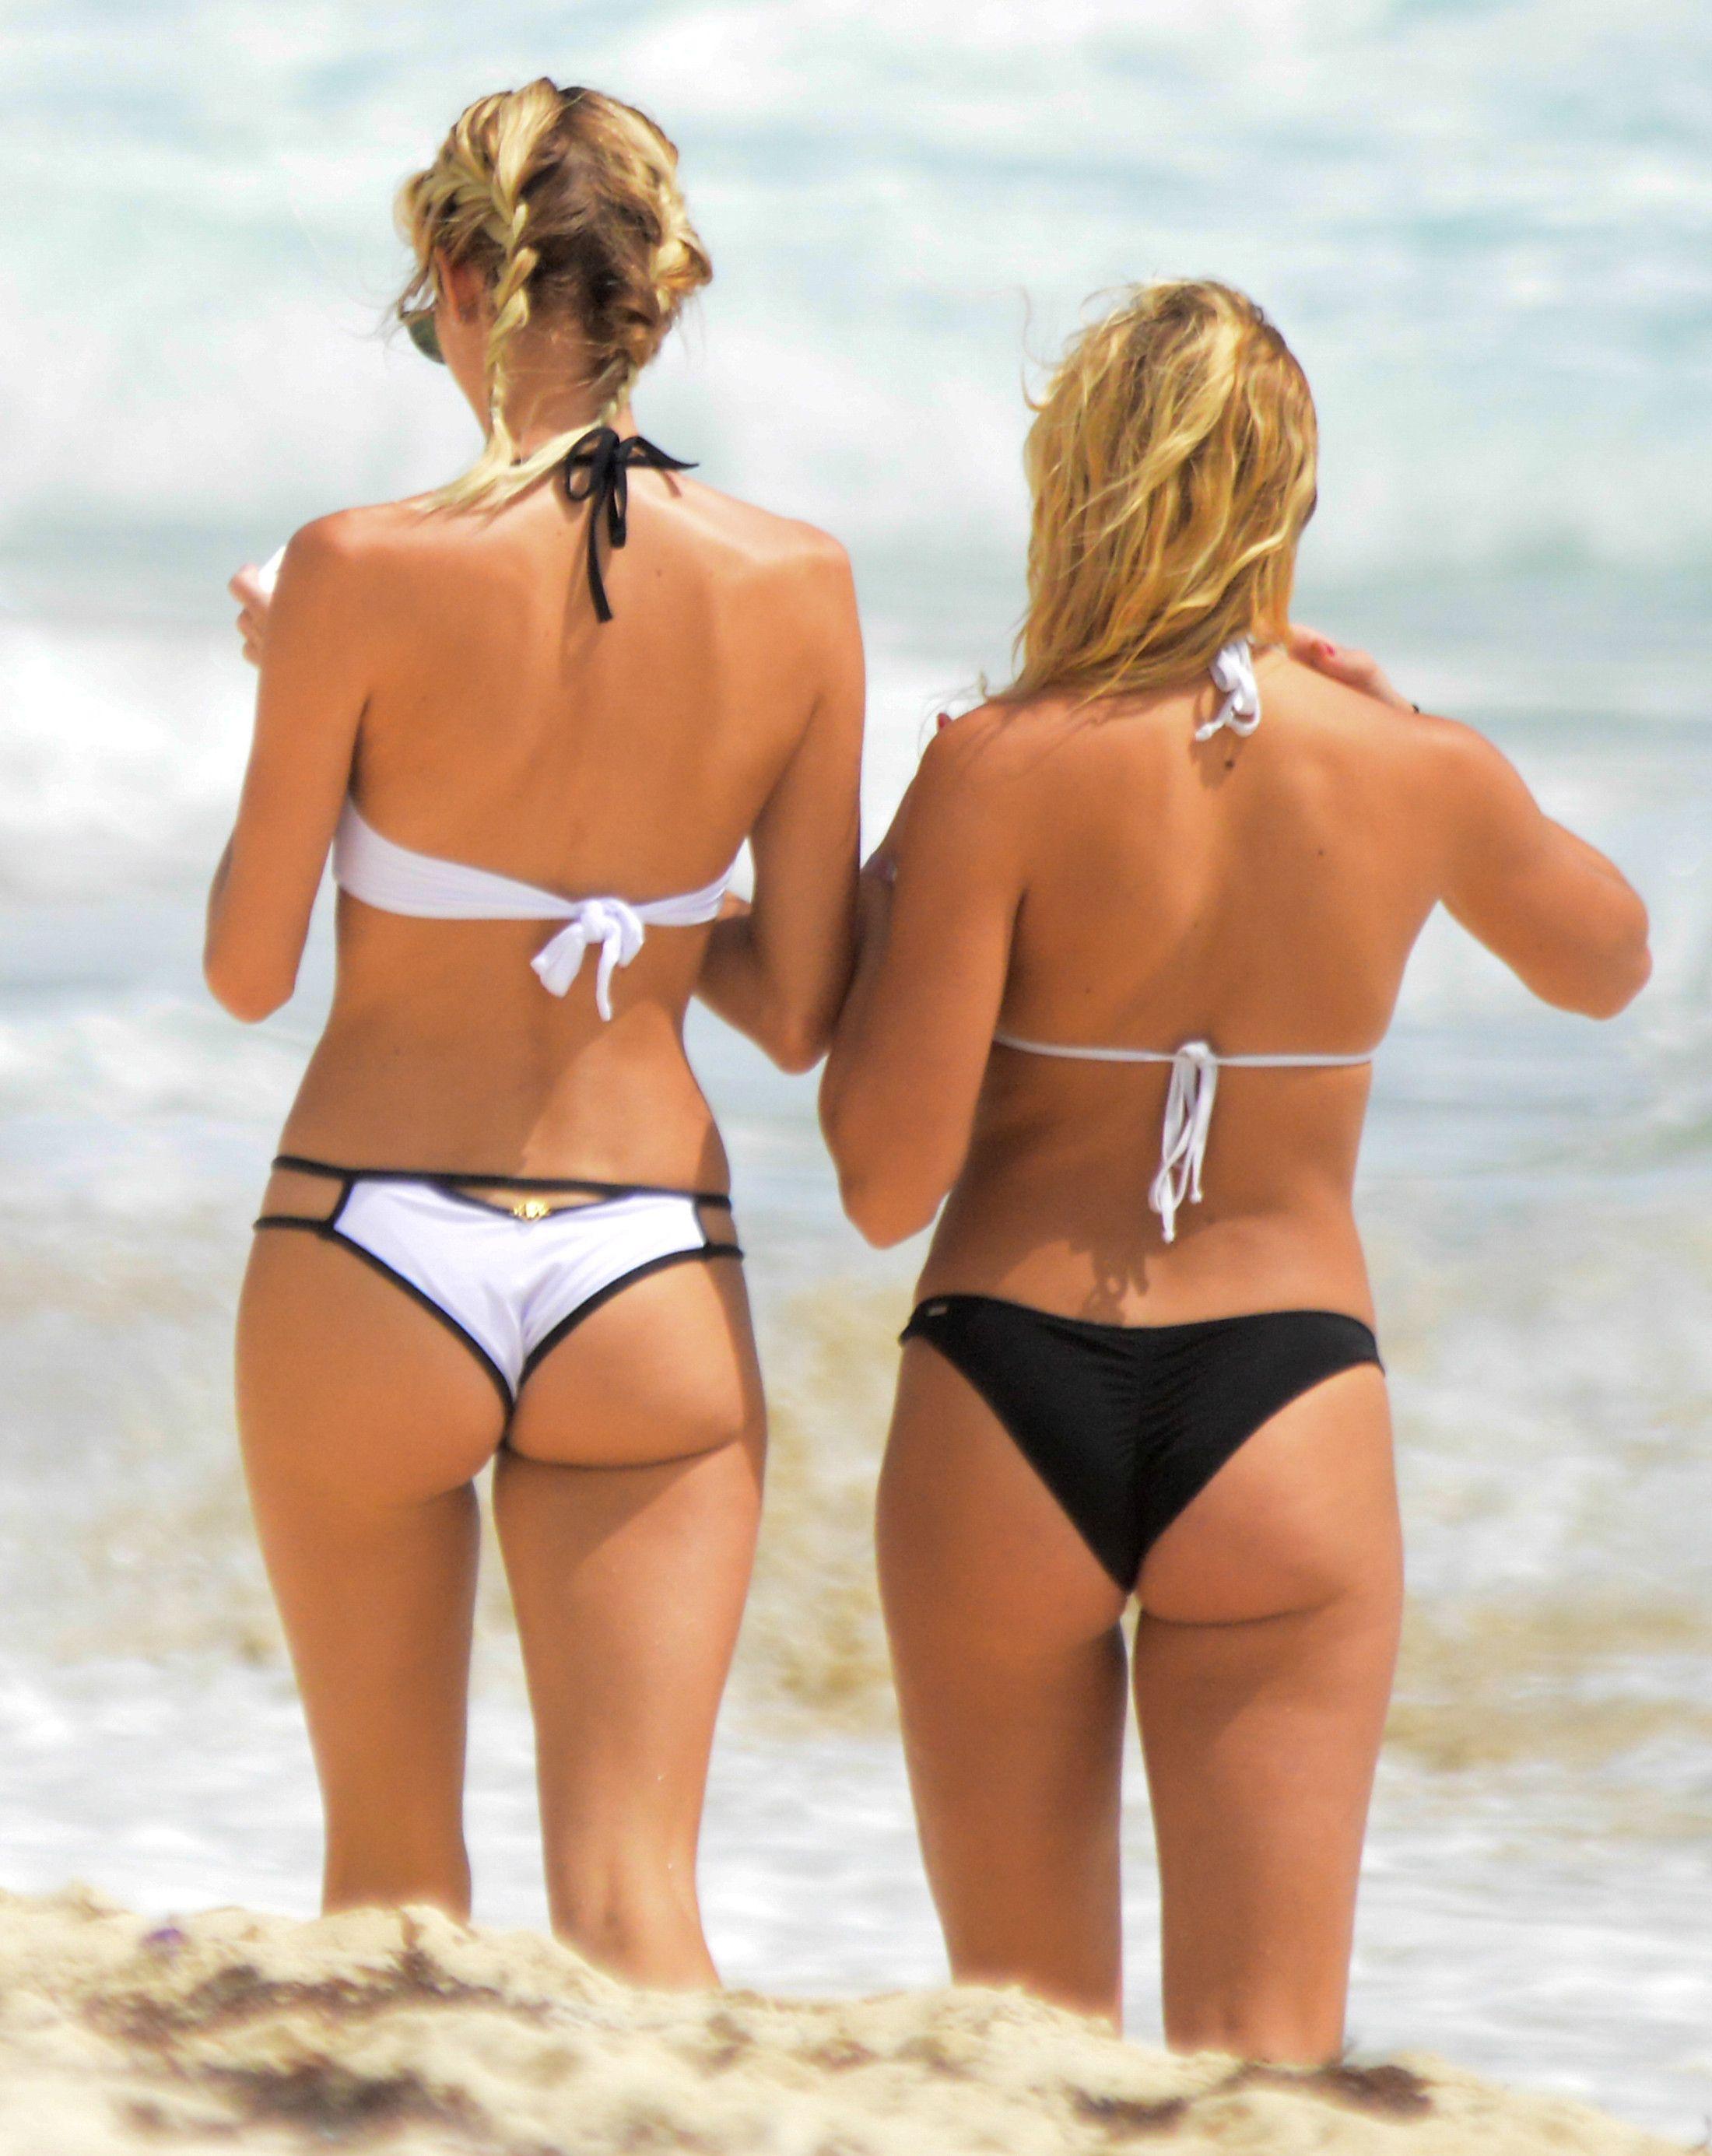 candid-bikini-galleries-jessica-rabbit-naked-pics